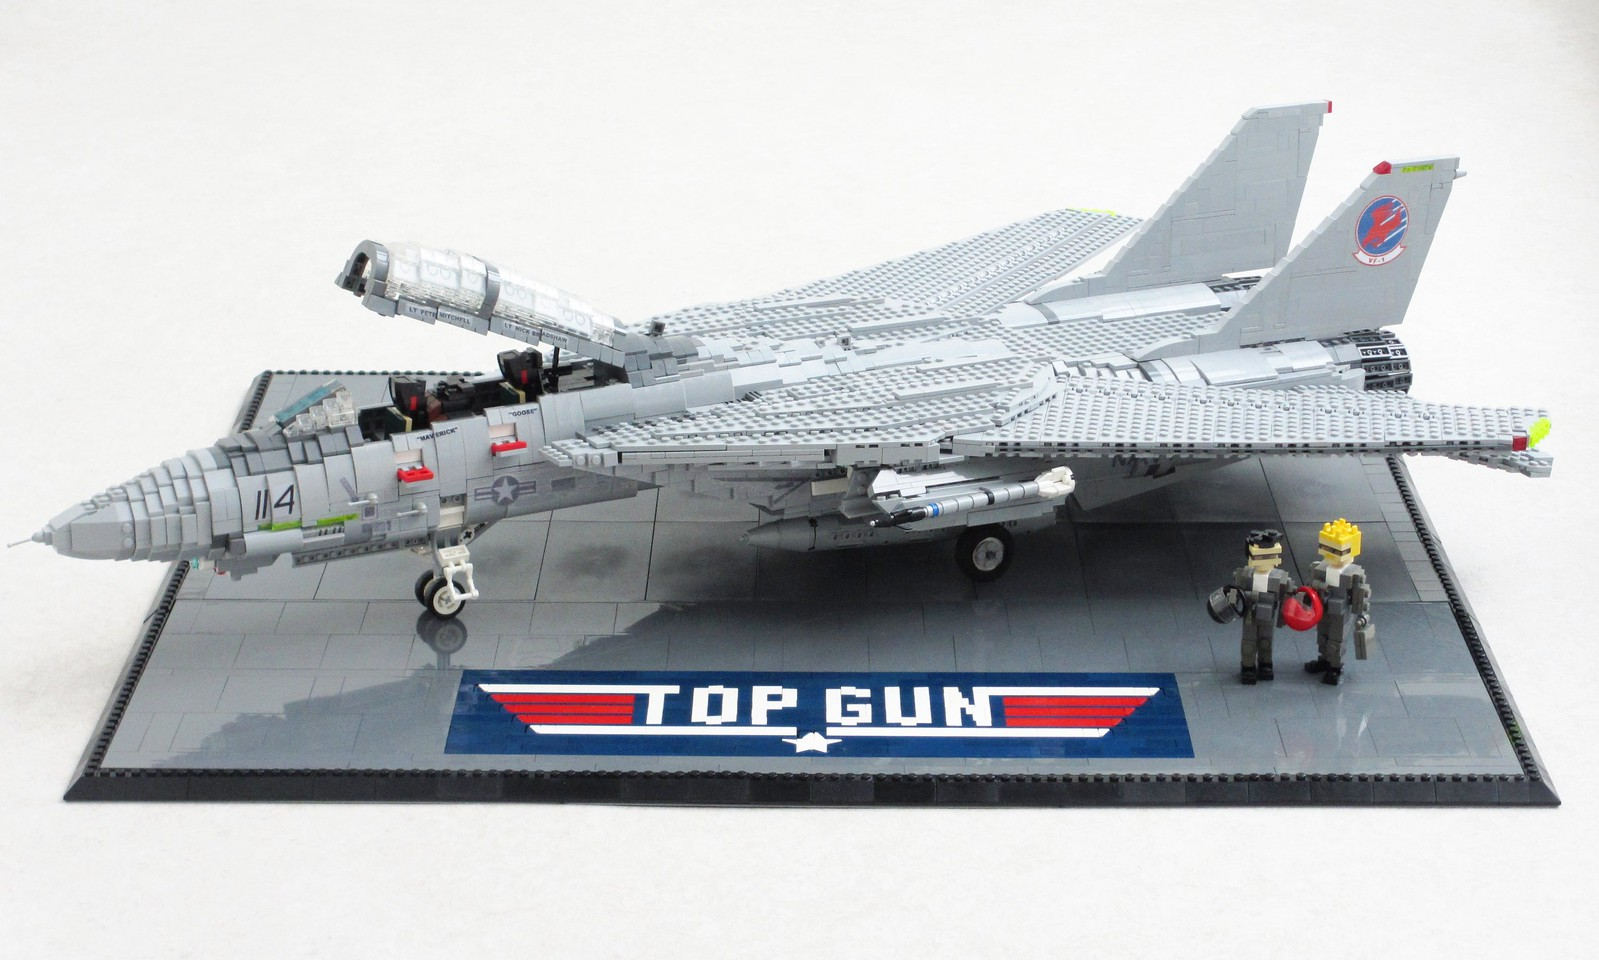 Top Gun display